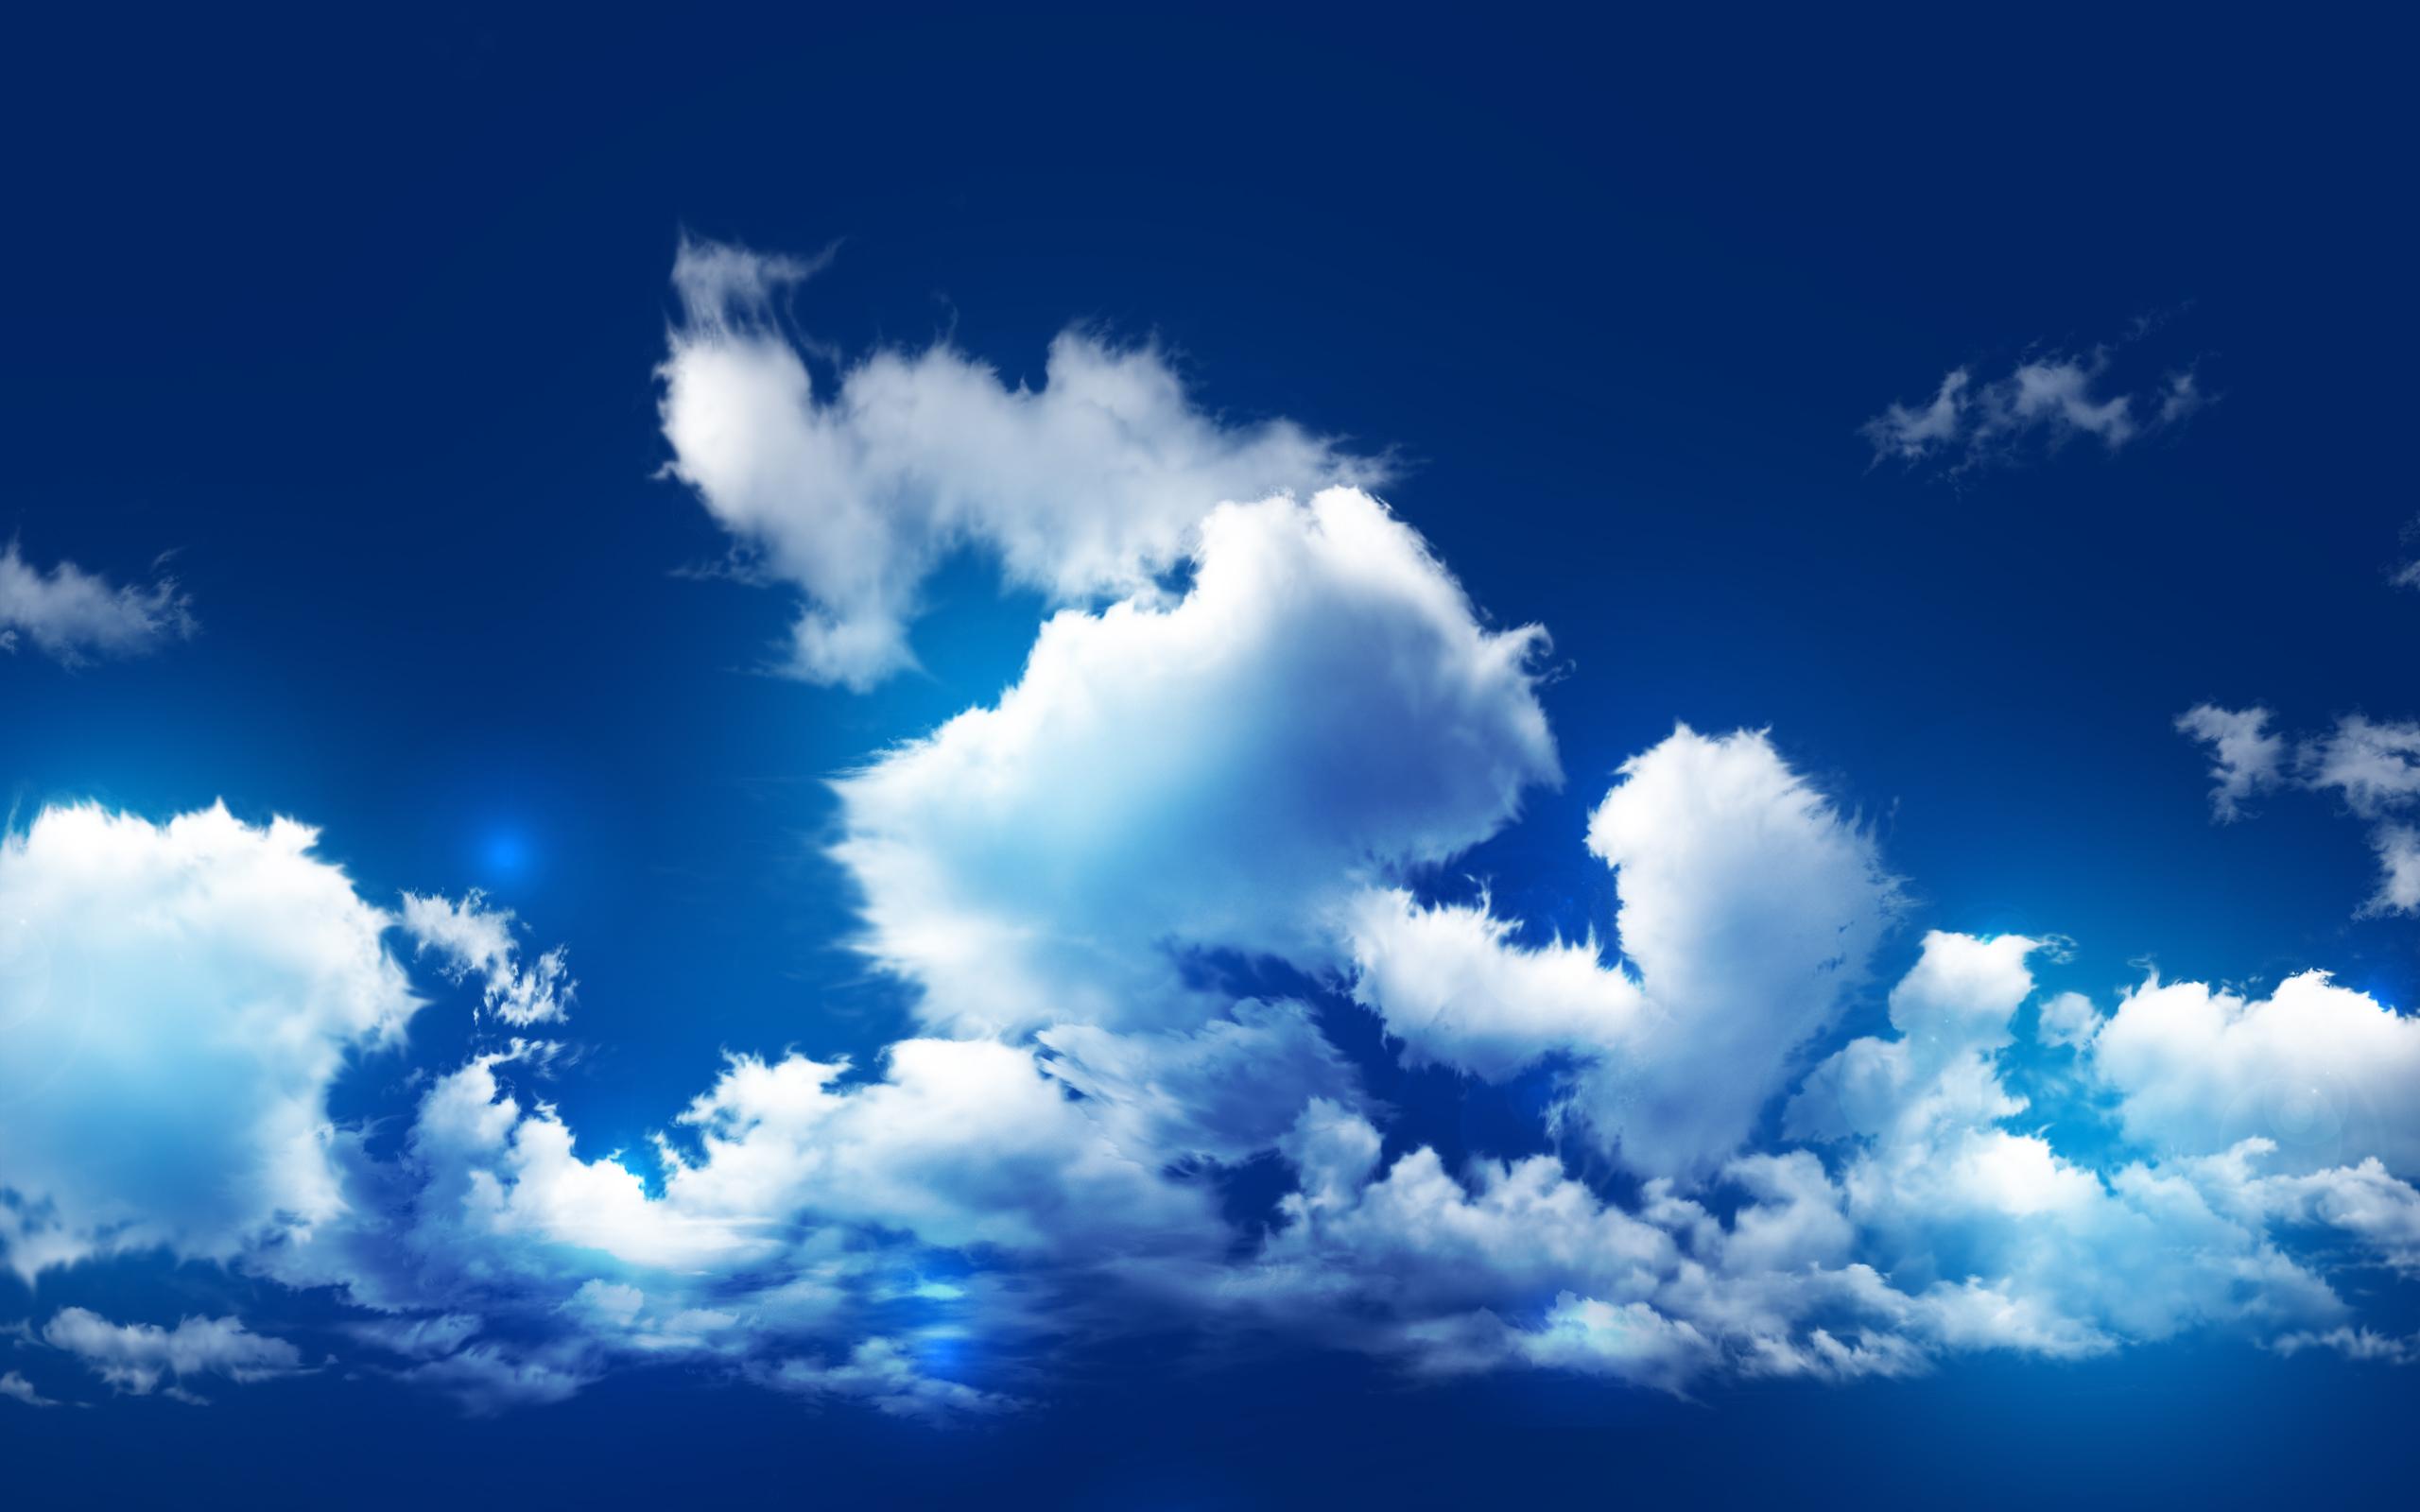 cloud wallpaper blue